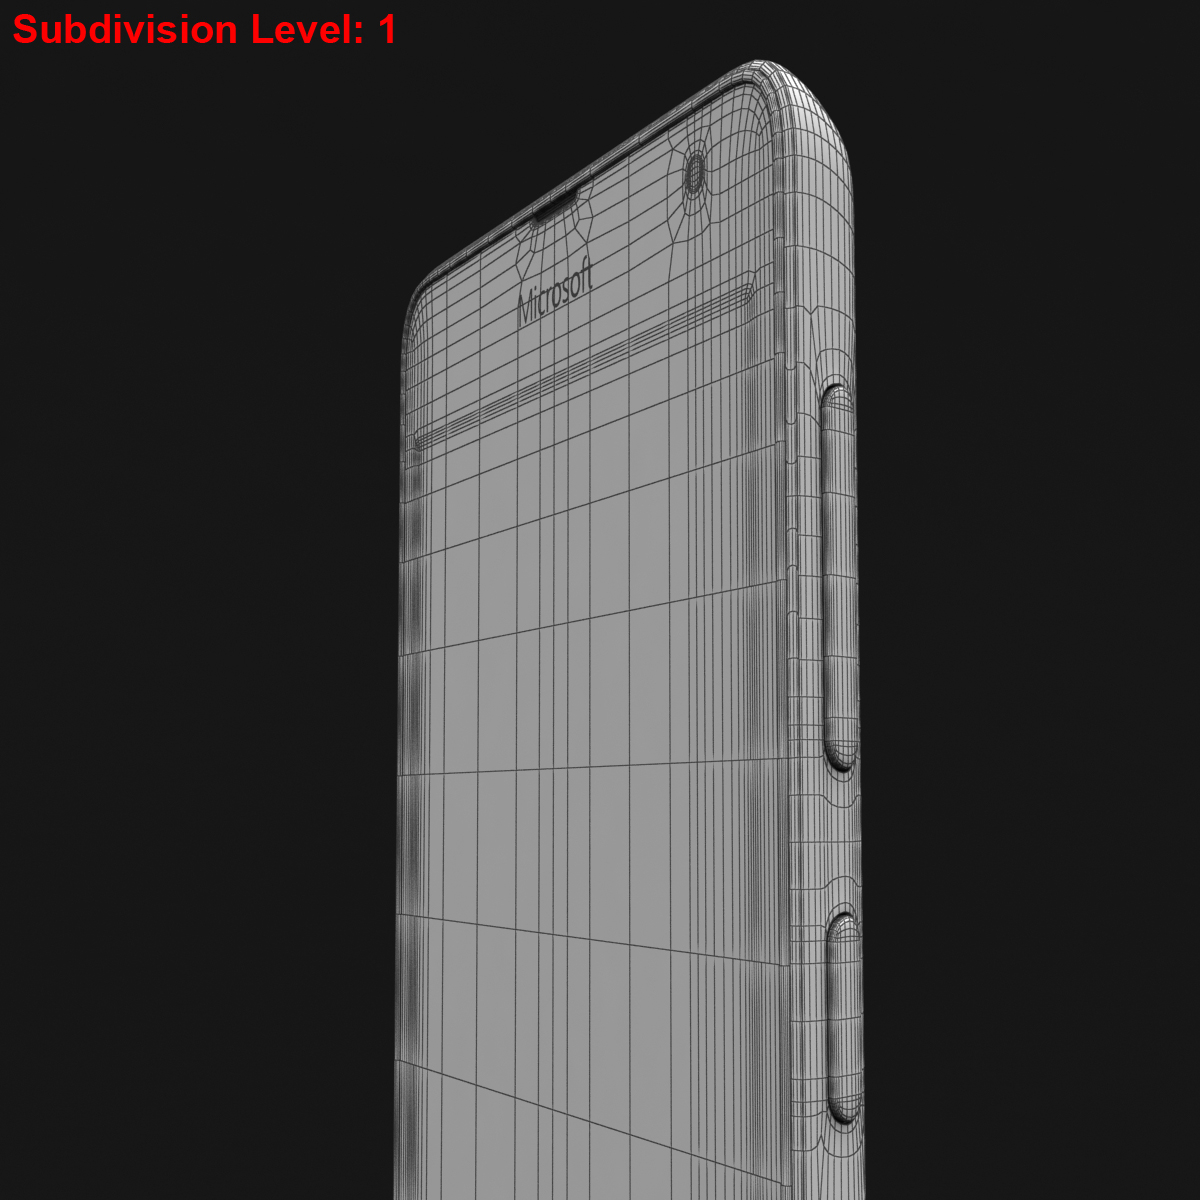 microsoft lumia 535 and dual sim orange 3d model 3ds max fbx c4d obj 204133